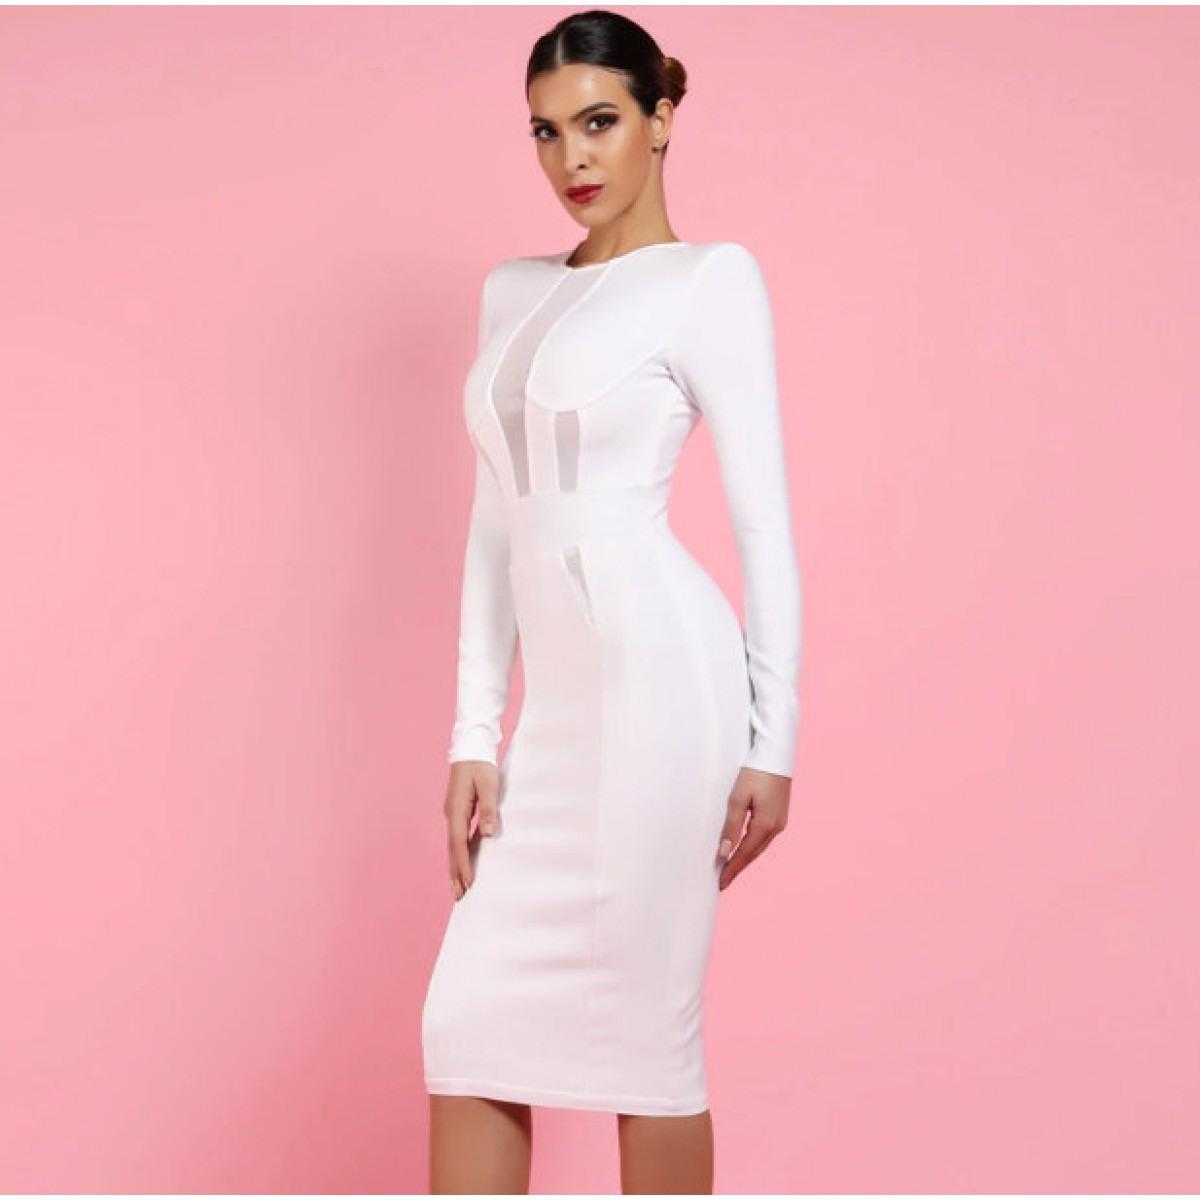 Designer Coolste Kleid Elegant Knielang Boutique17 Schön Kleid Elegant Knielang Design